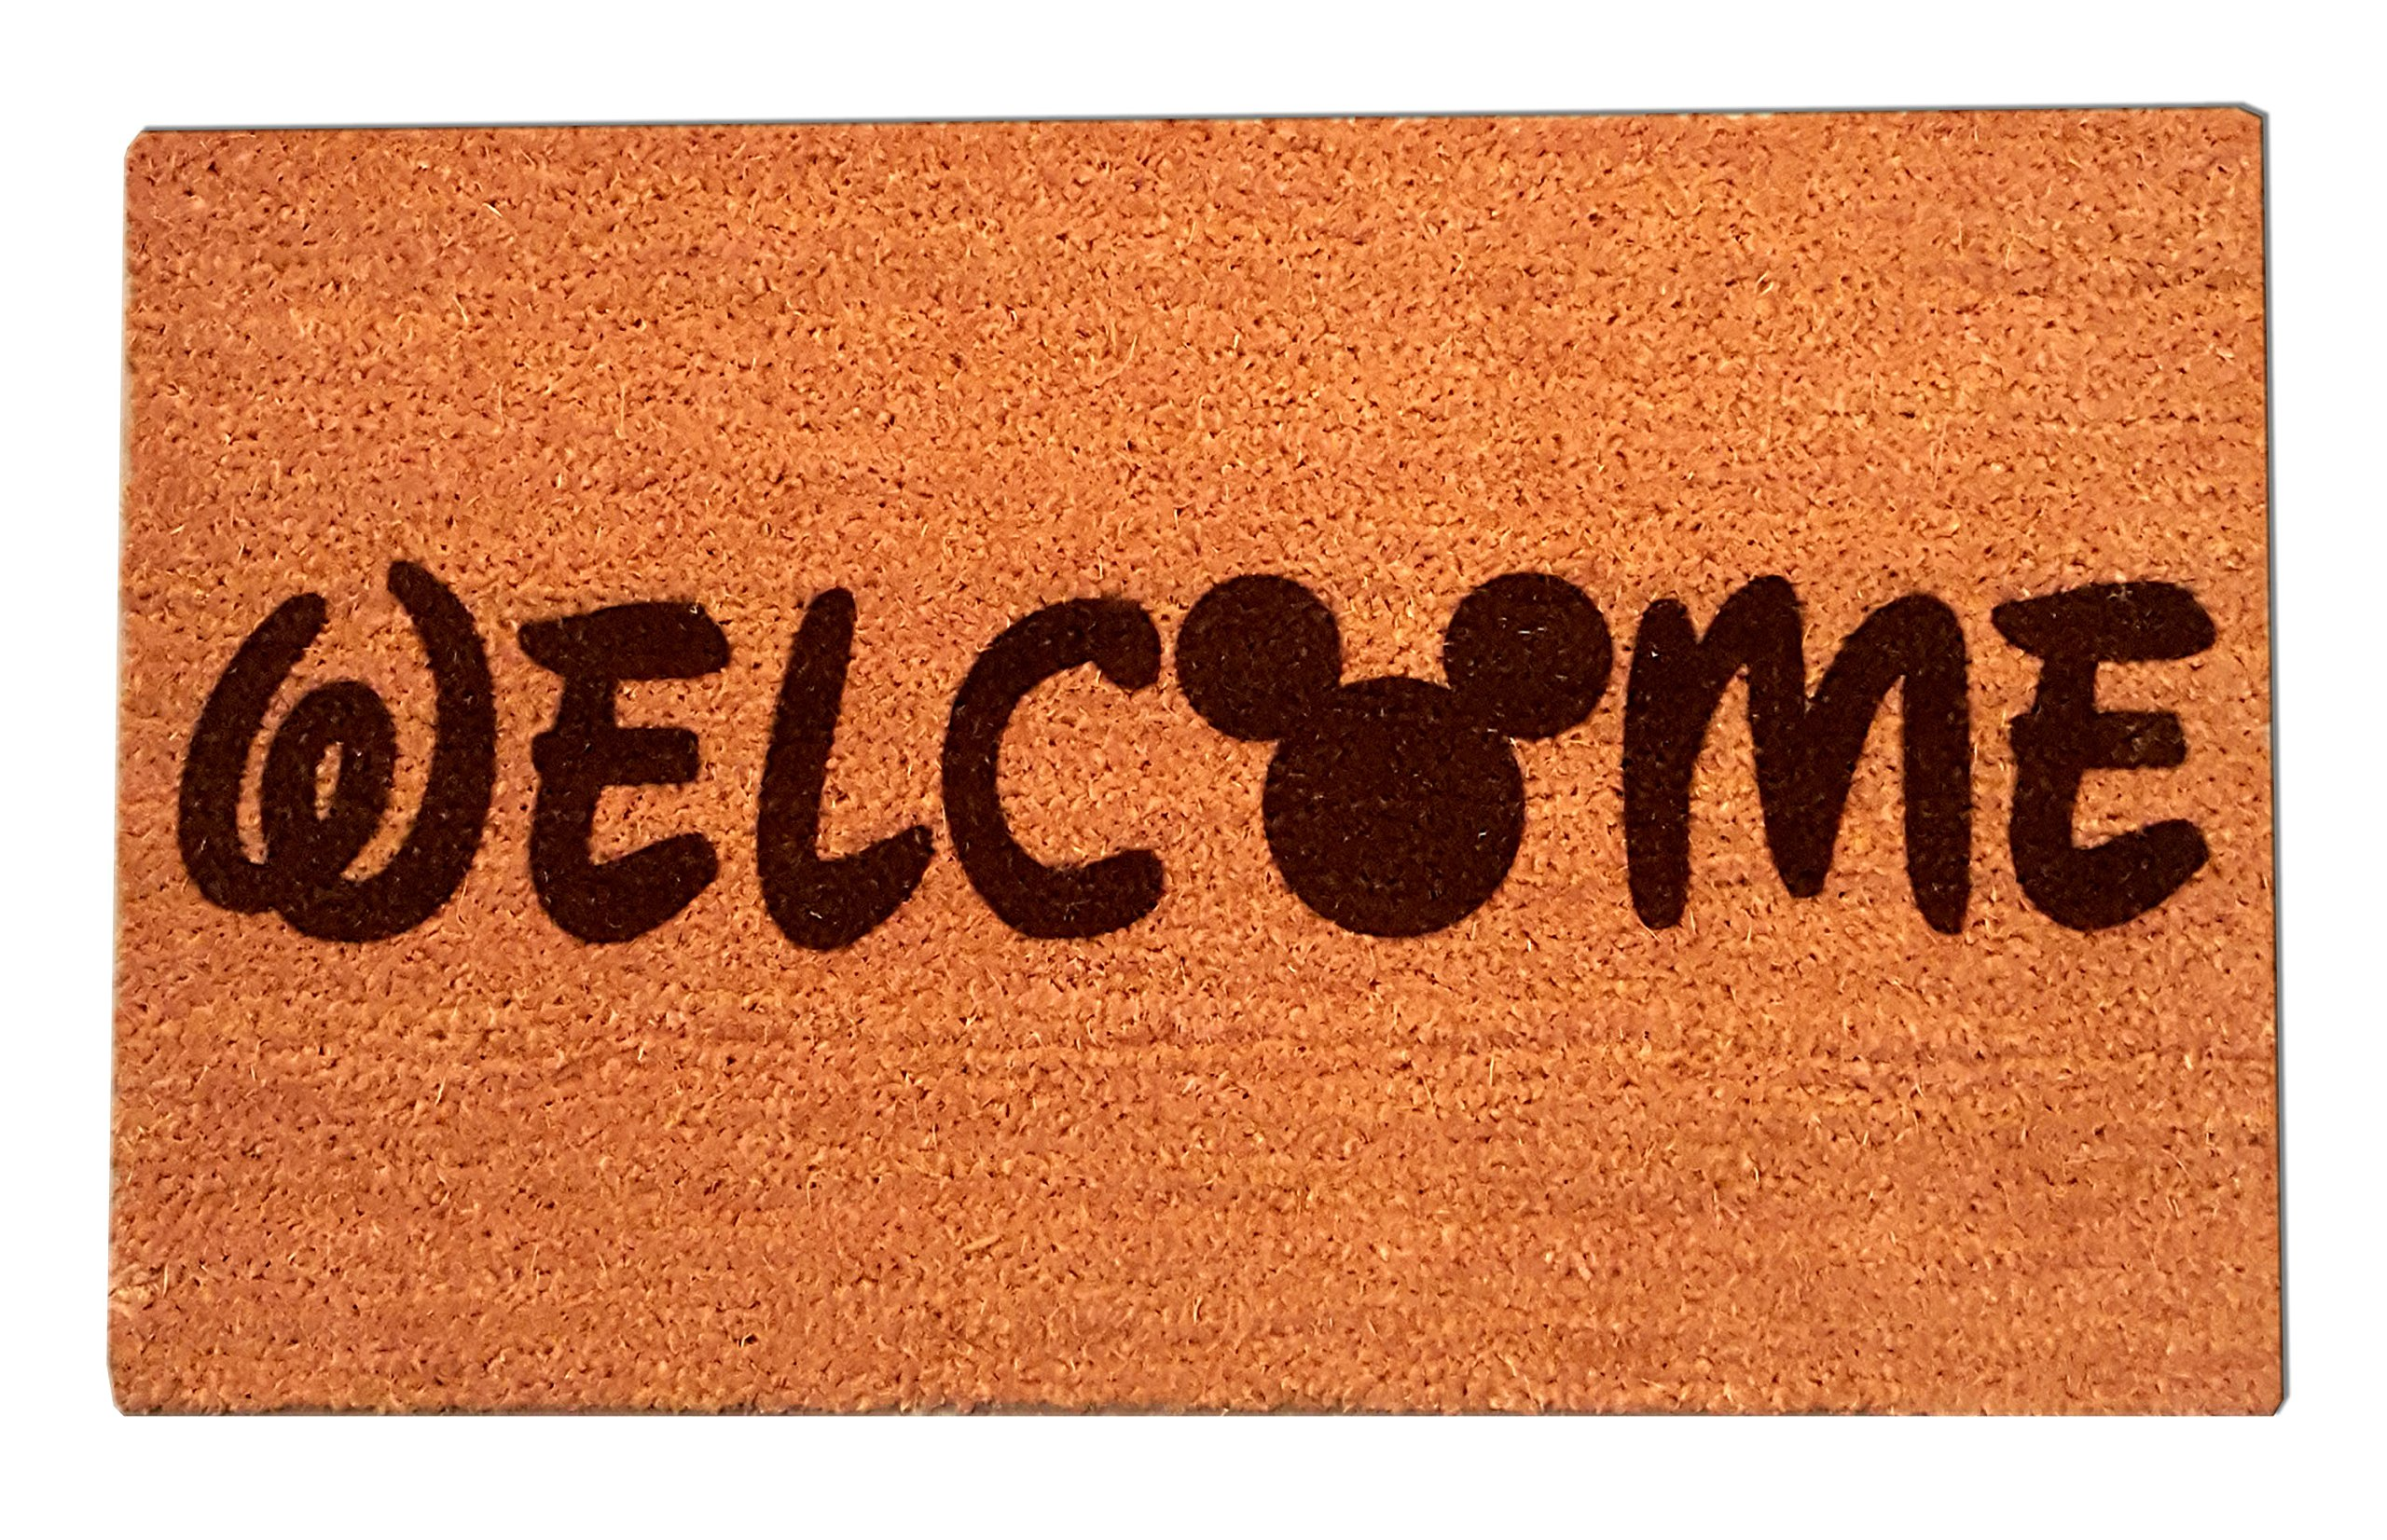 "Disney Mickey Mouse Welcome Laser Engraved Coir Fiber Doormat 30"" x 18"""